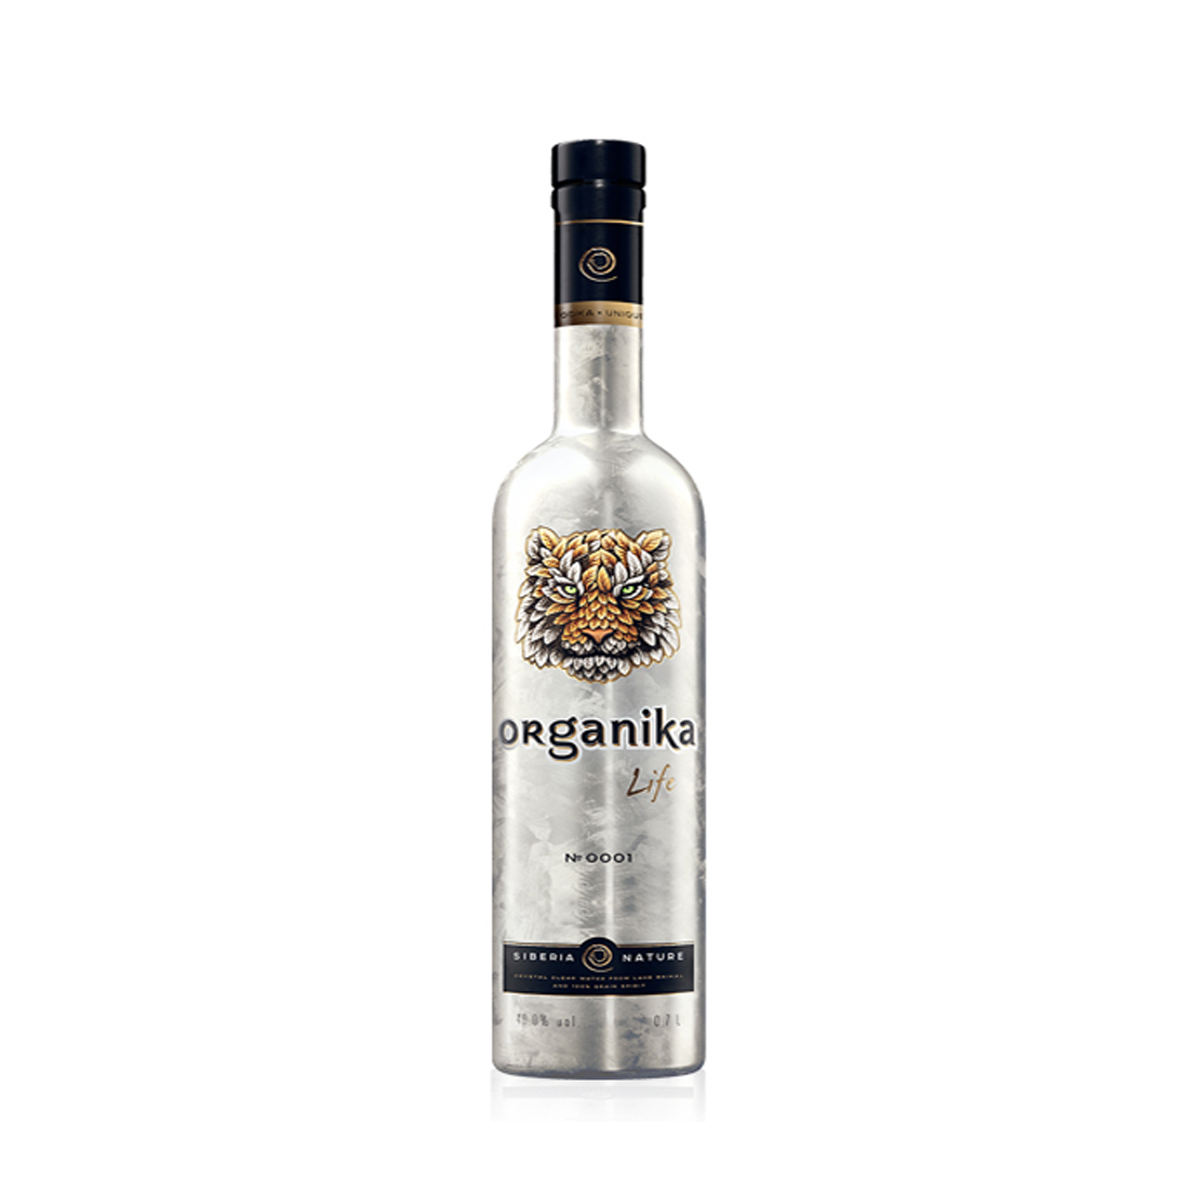 Elite Organika Life vodka with Sagan-Daila extract 700ml glass bottle, alcoholic drinks